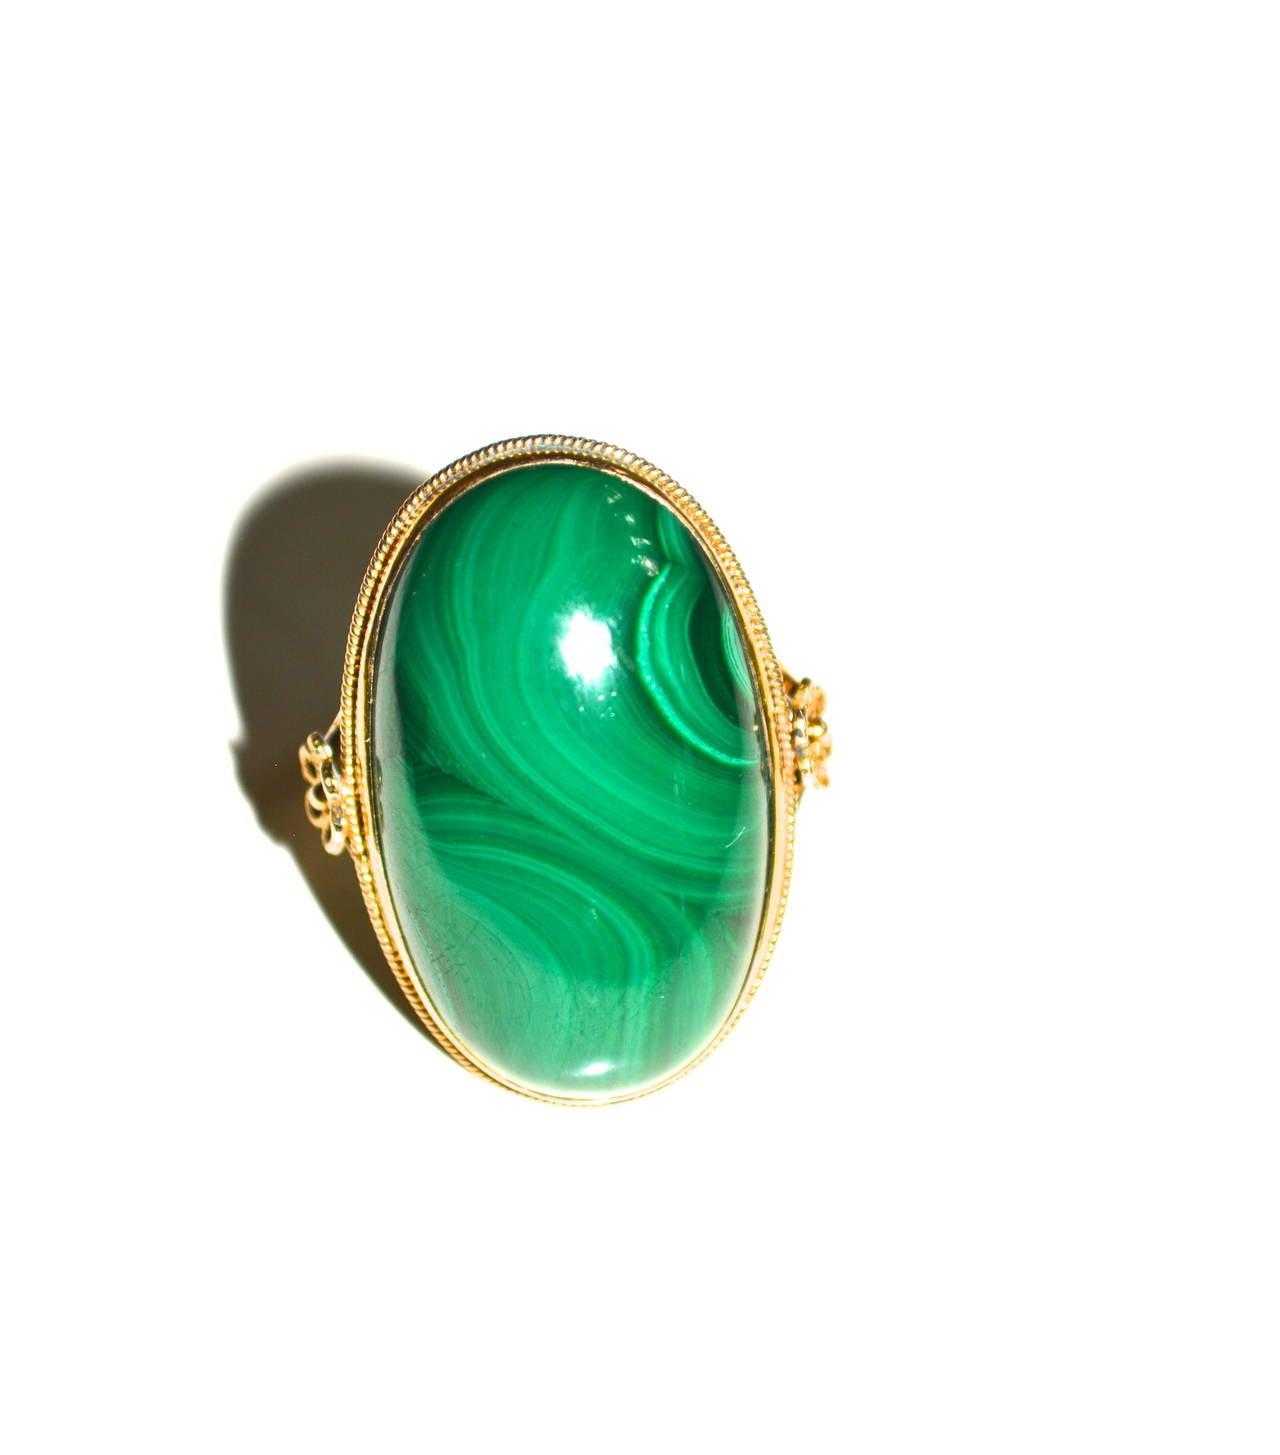 Edwardian 18K Gold Malachite Ring 2